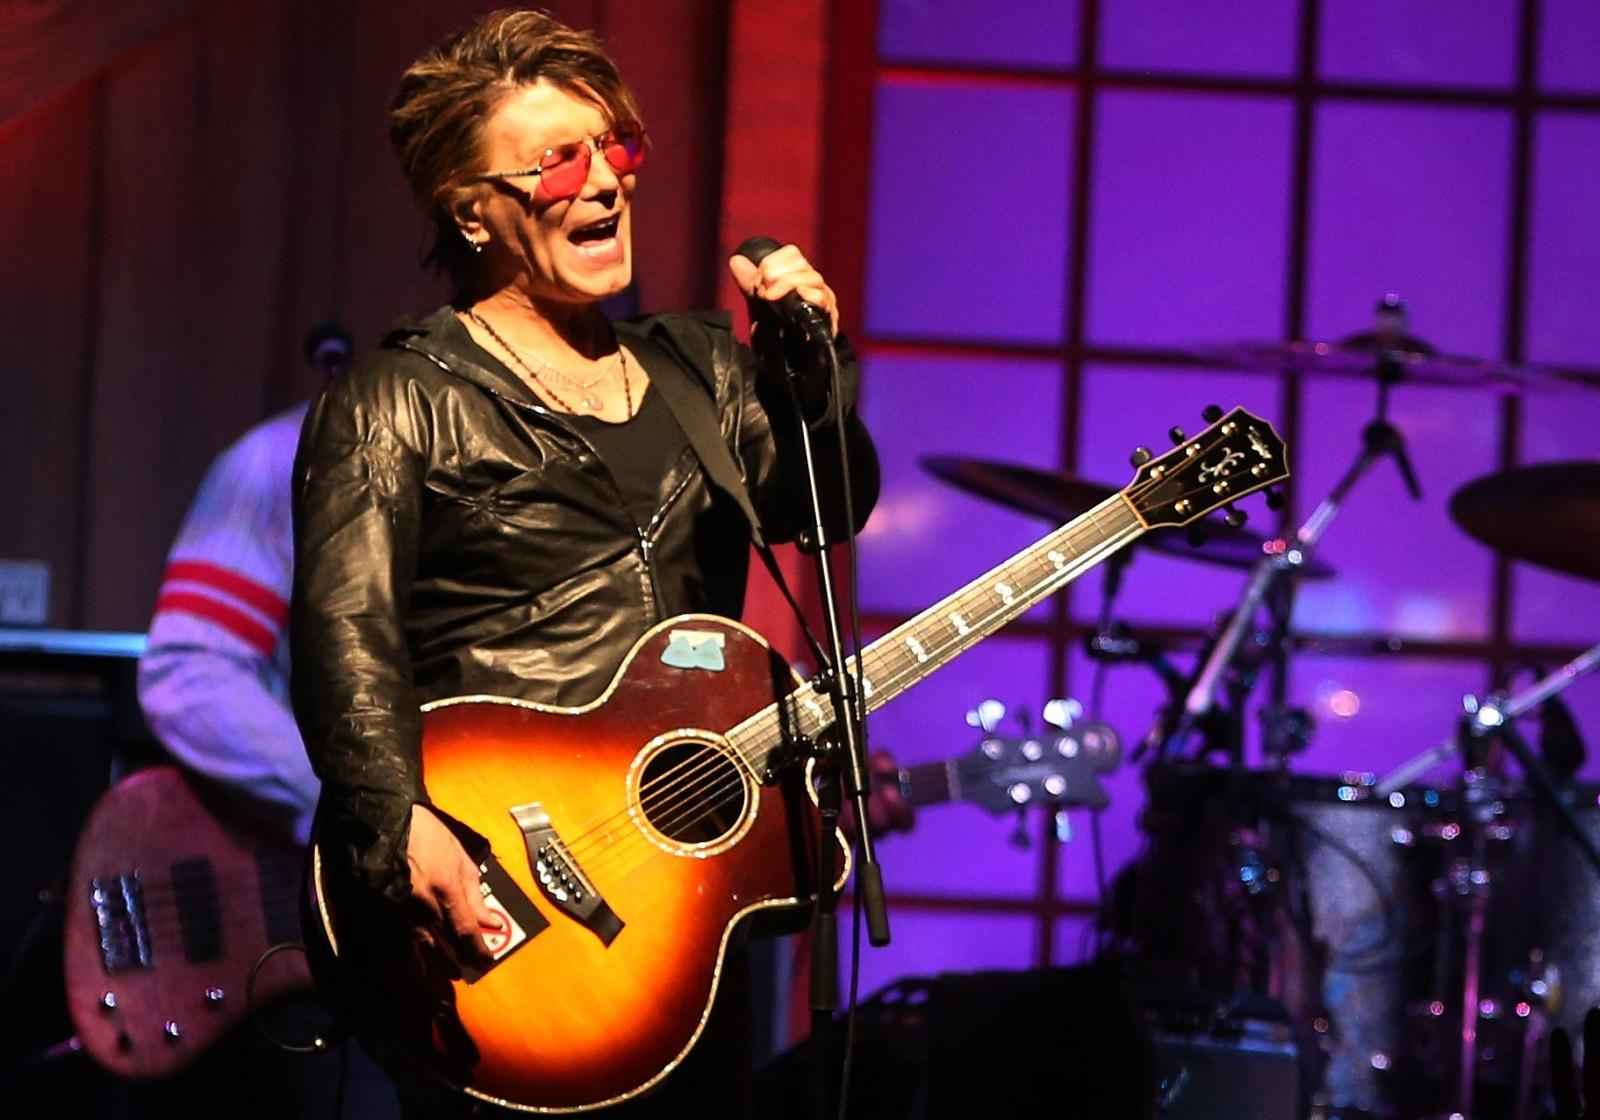 Goo Goo Dolls frontman John Rzeznik is preparing for fatherhood. (Sharon Cantillon/Buffalo News file photo)